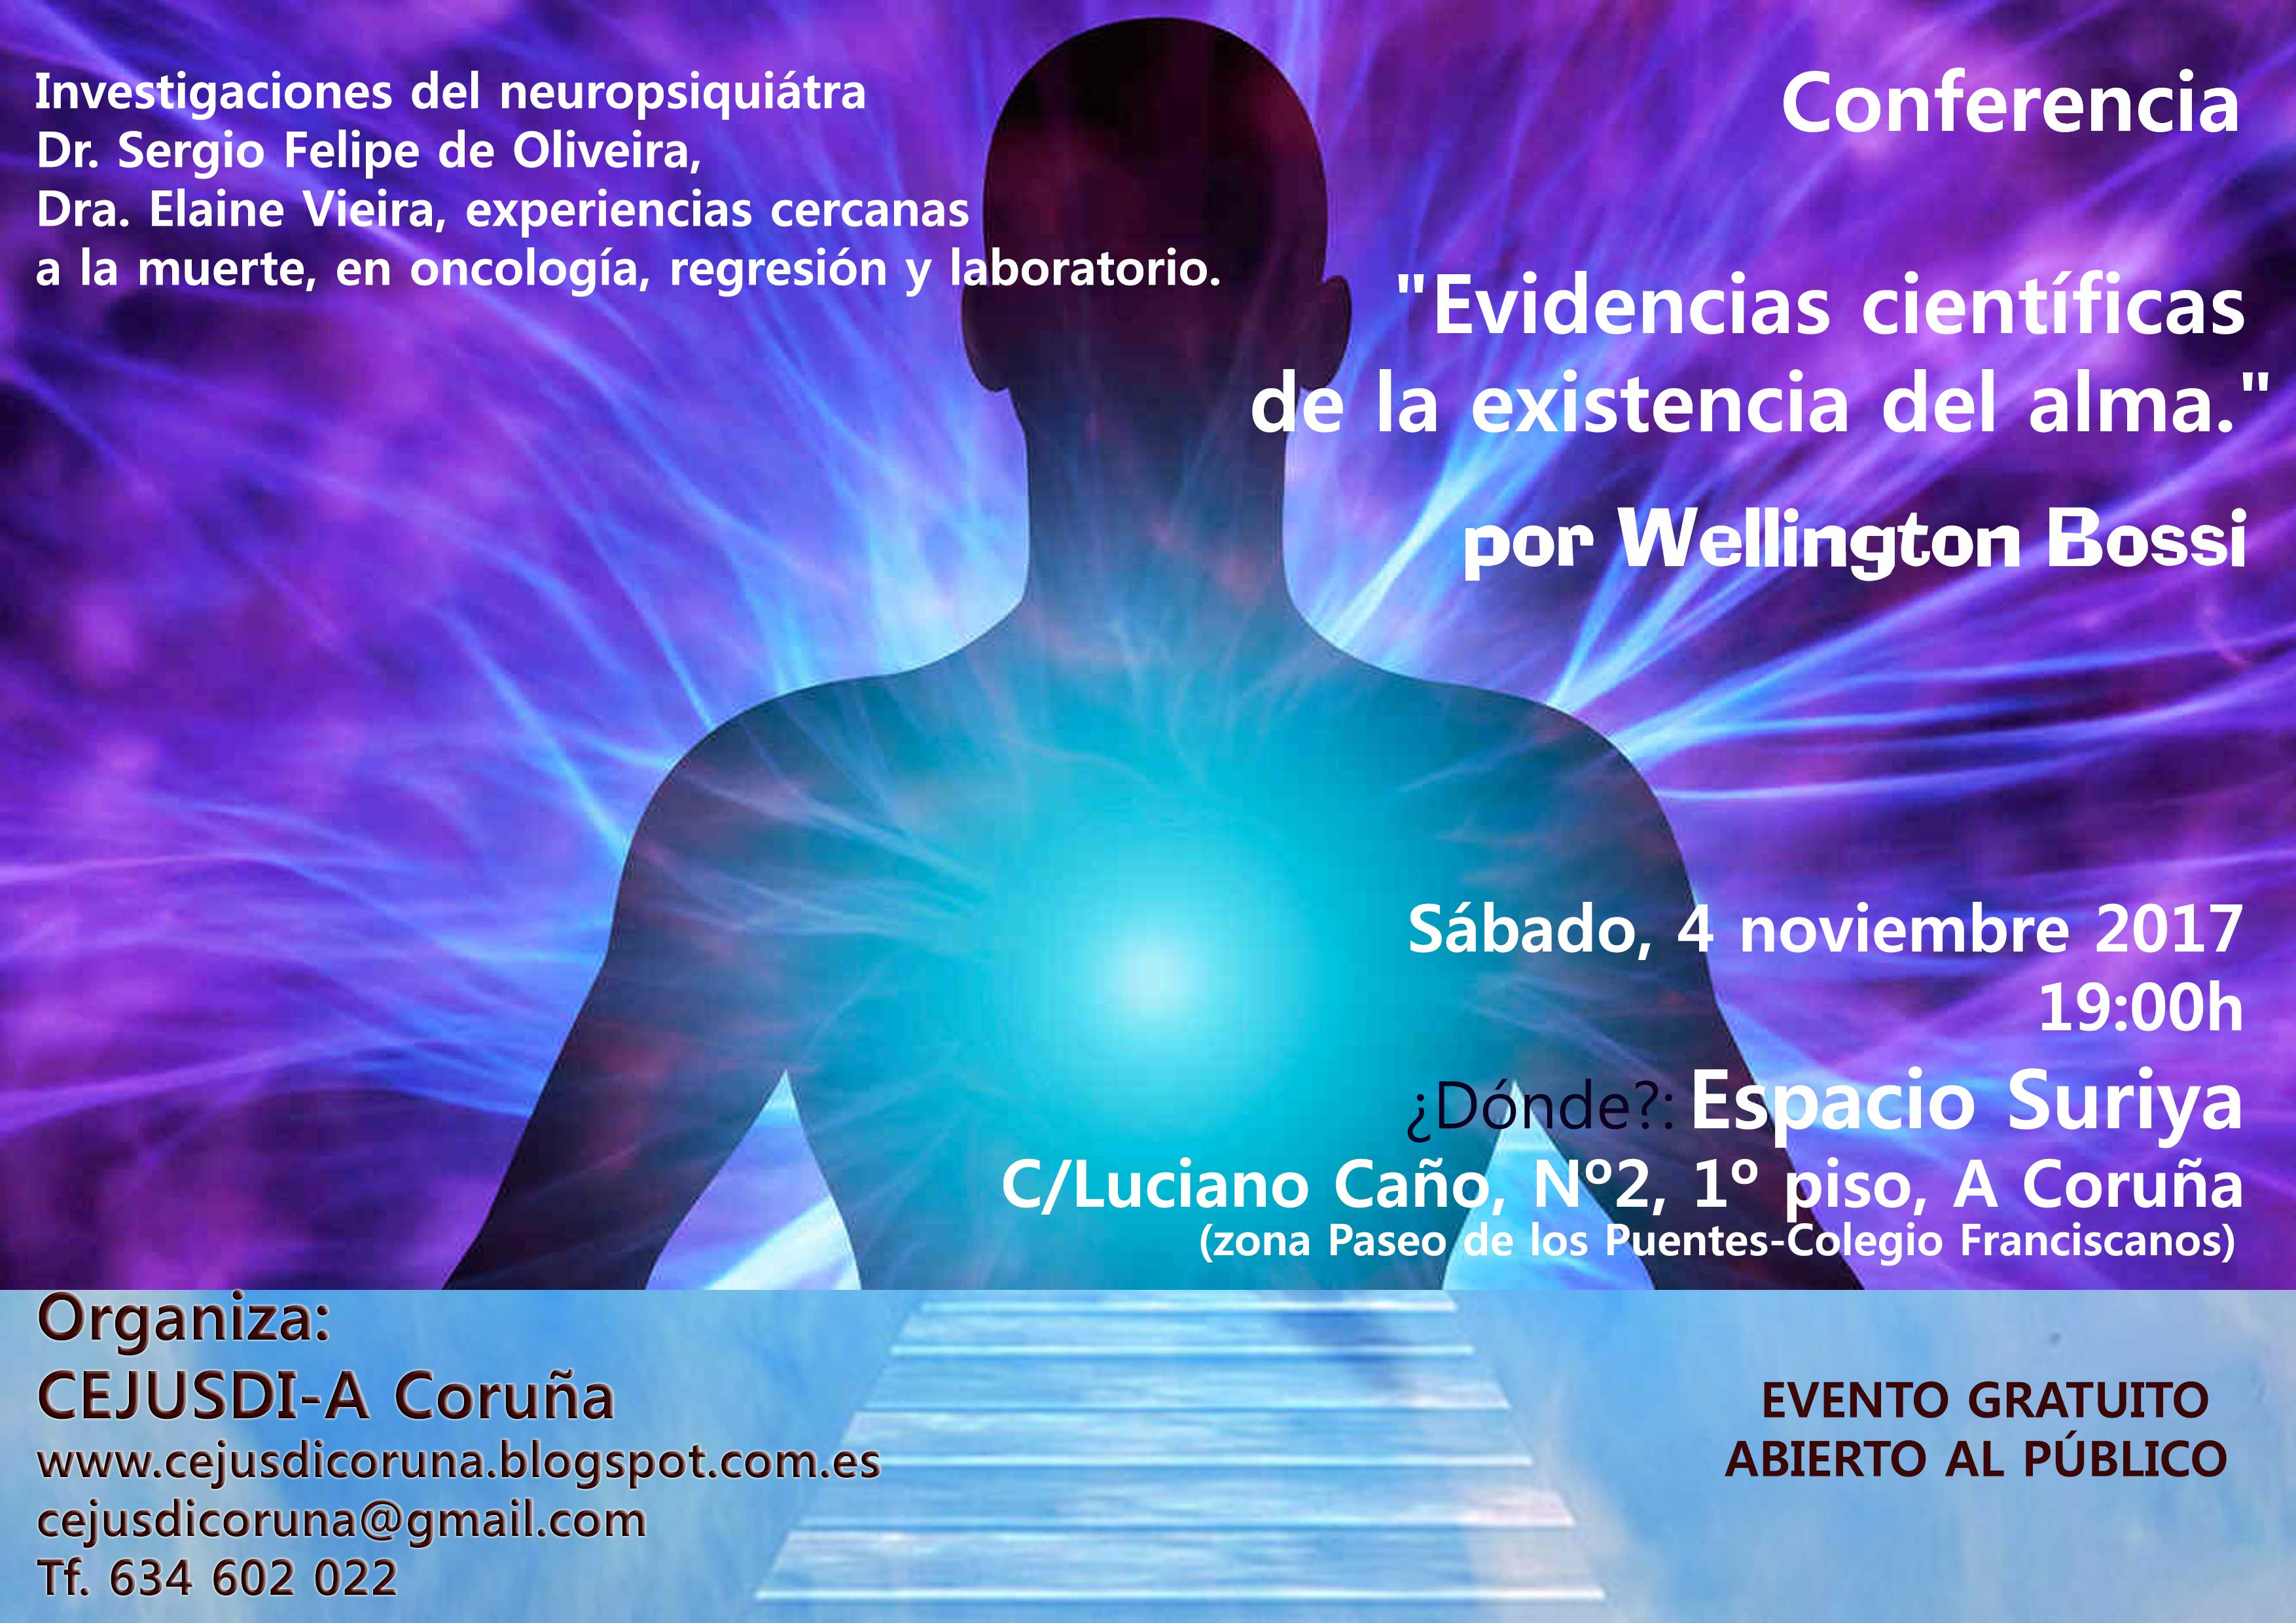 Conferencia gratuita: